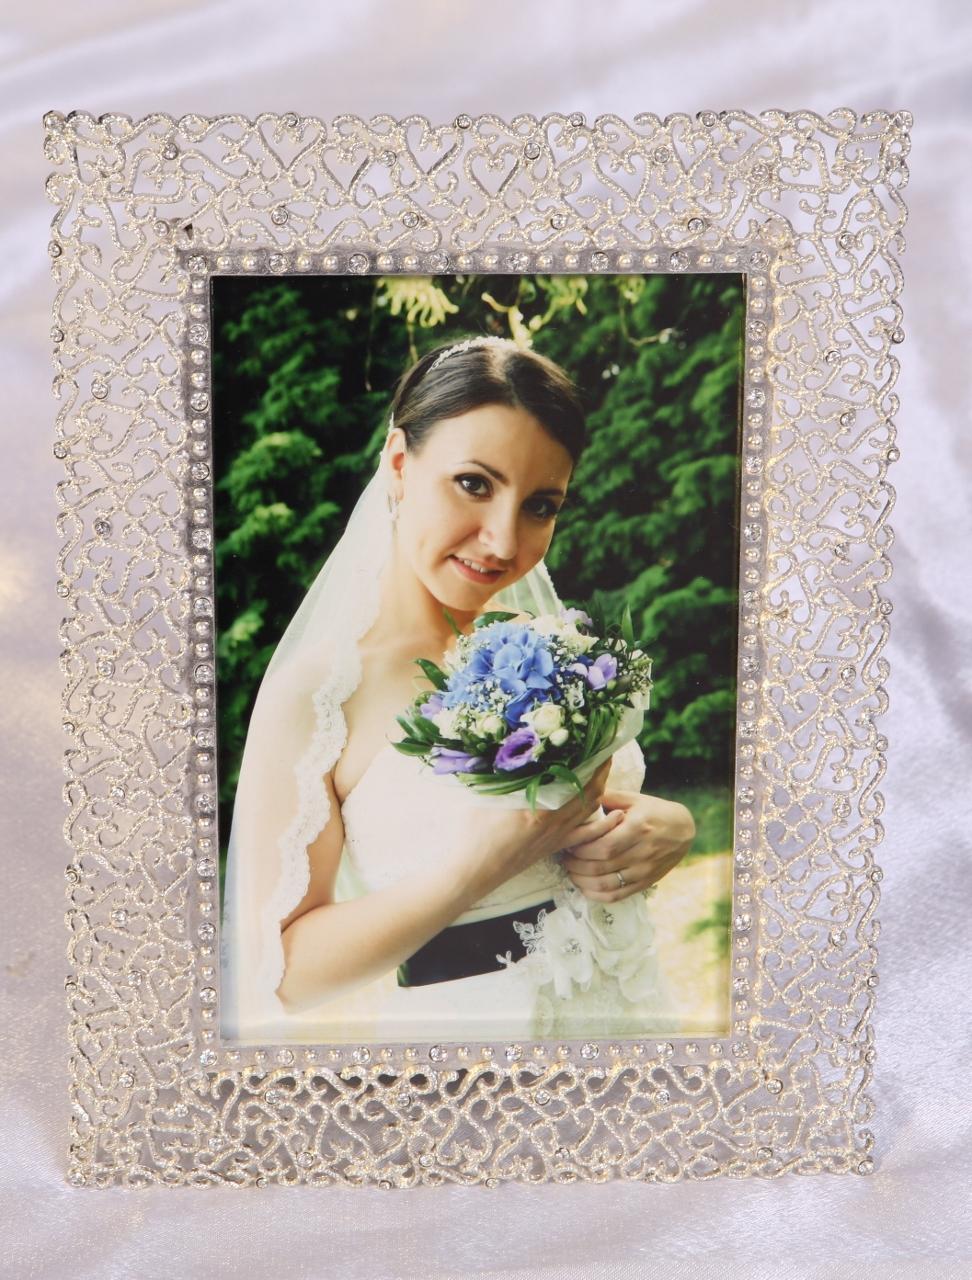 Fotorámeček  SILVER  WEDDING 10x15/M269